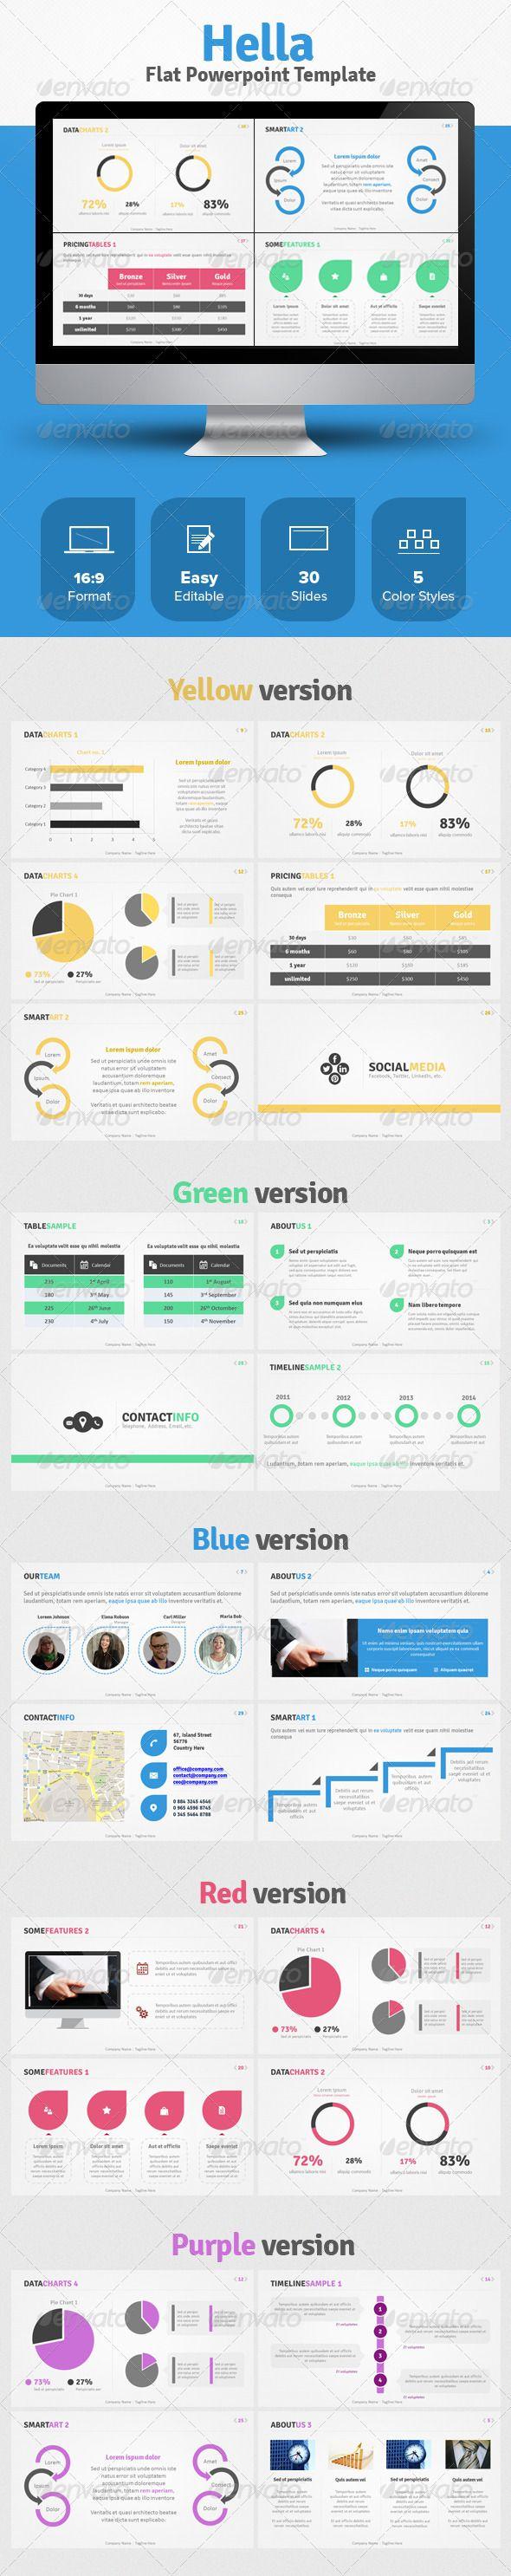 Hella Flat design template